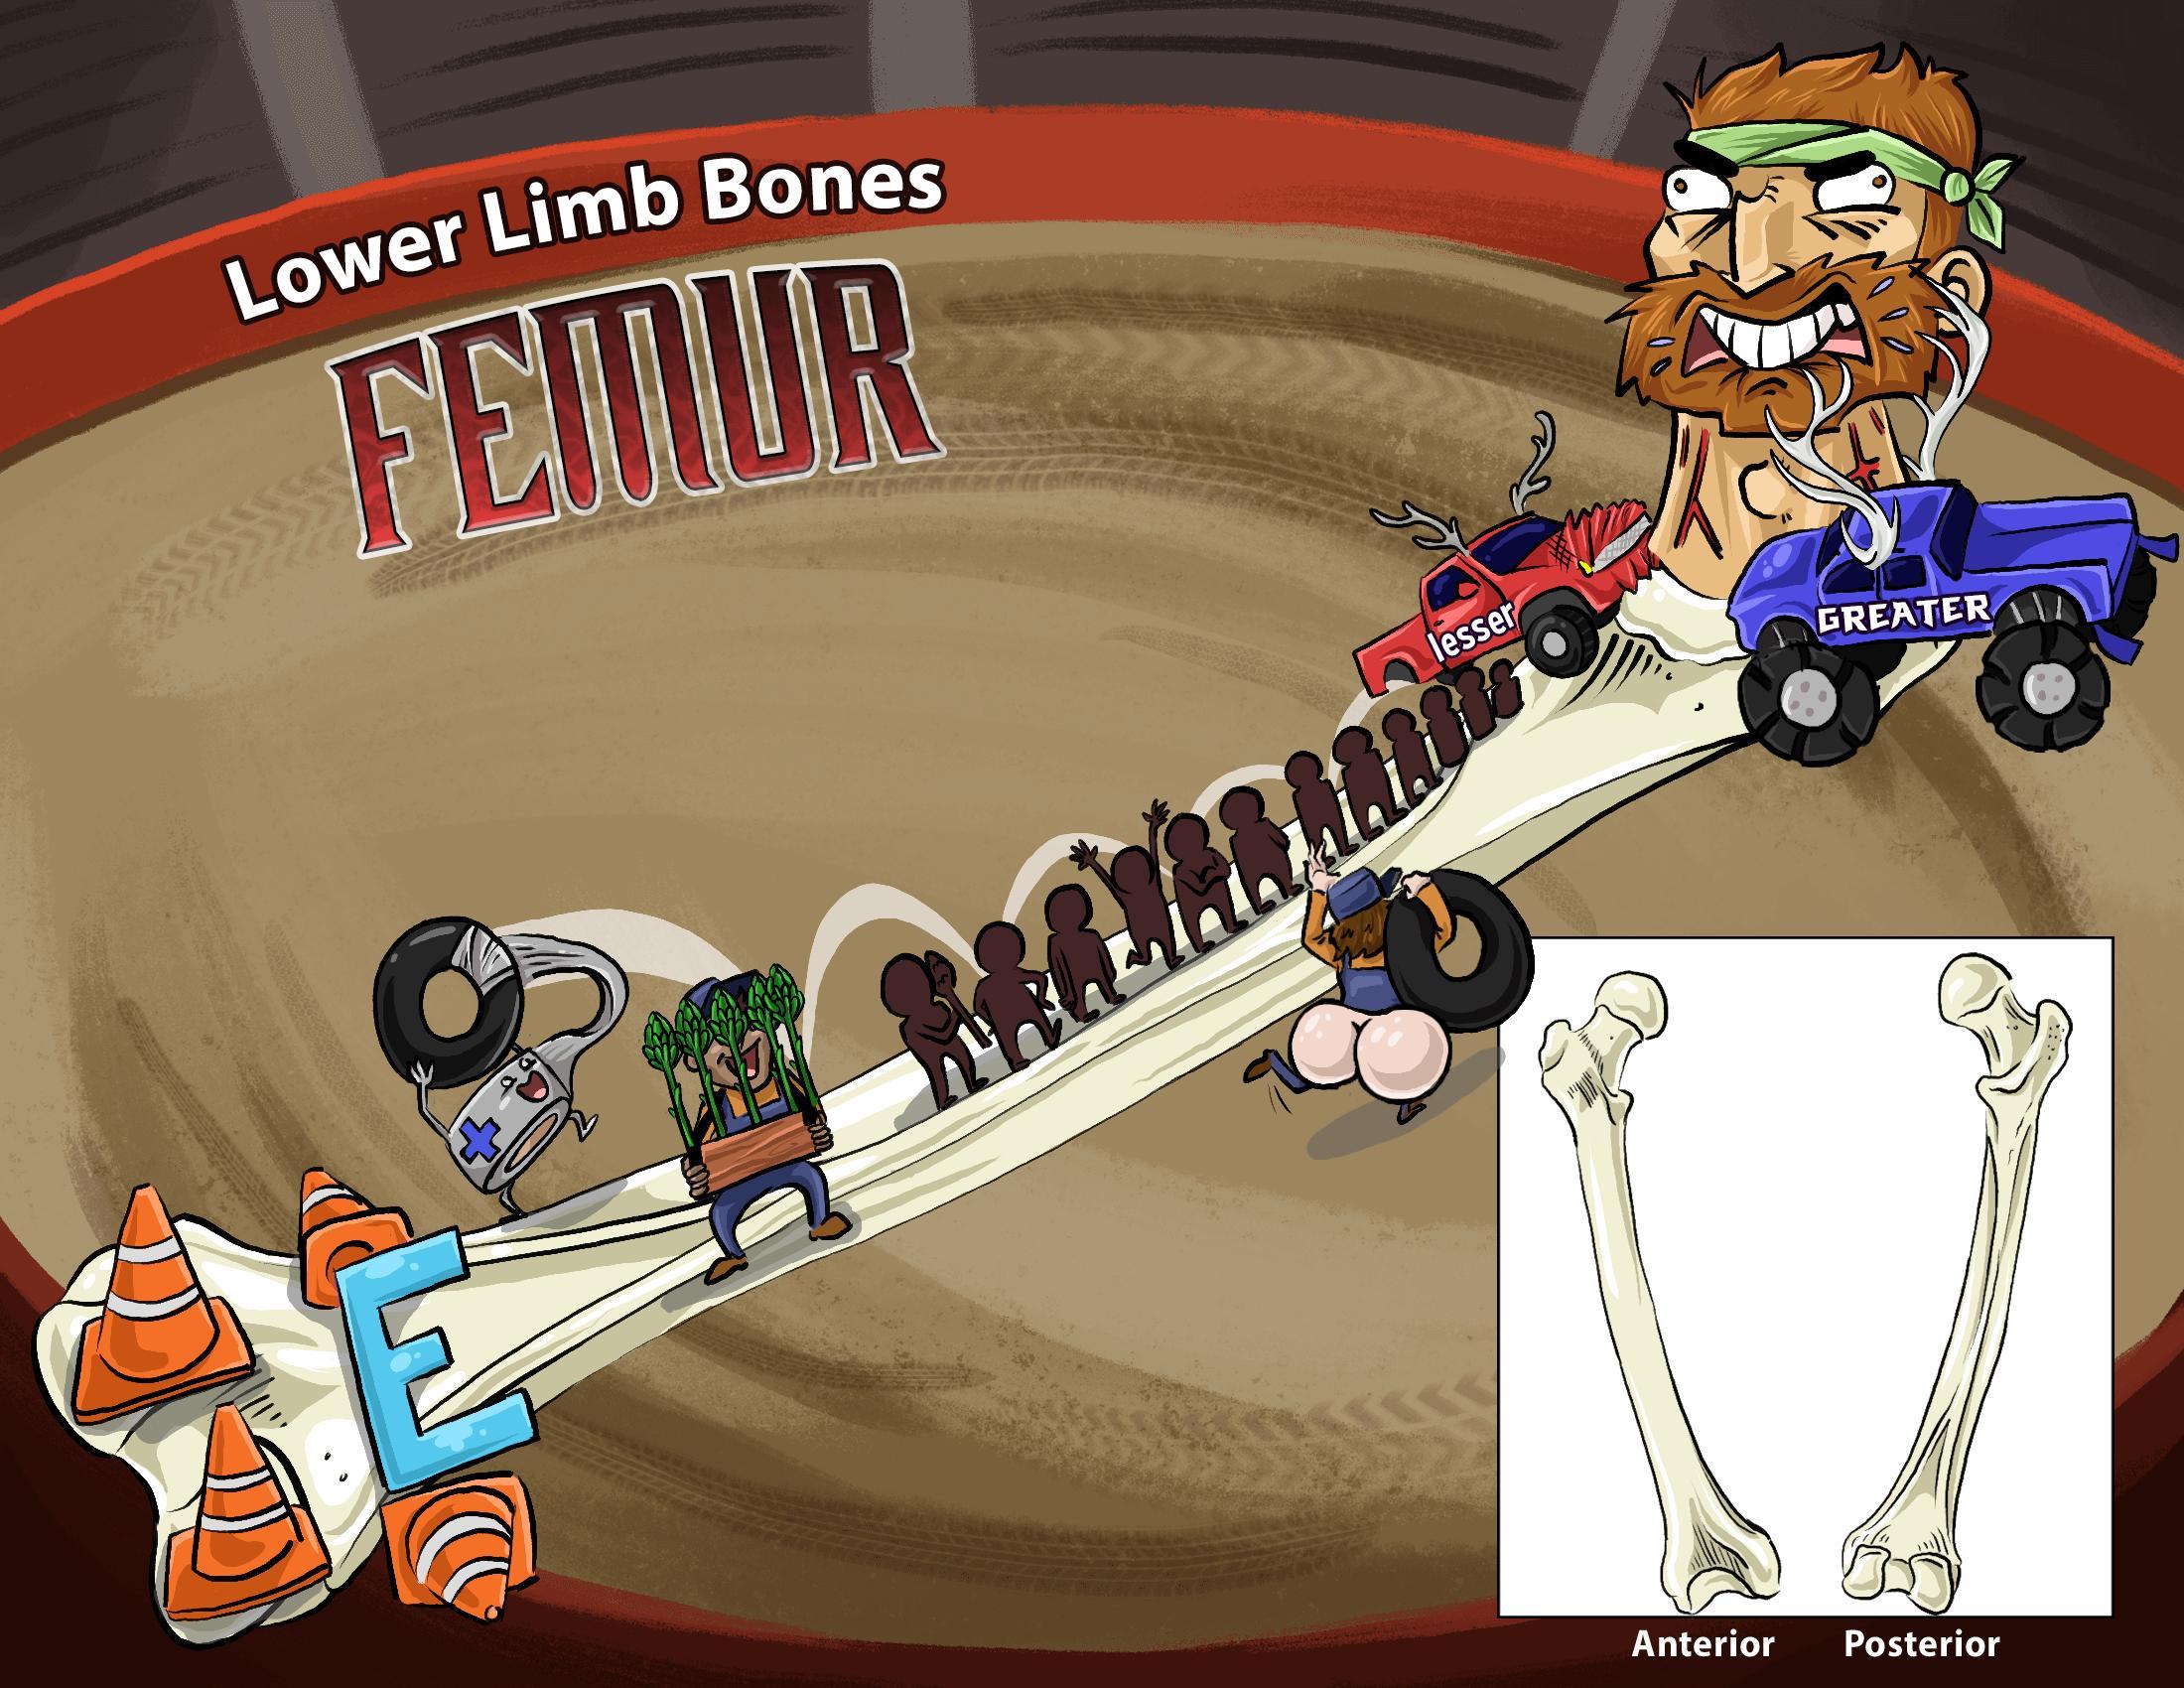 Lower Limb Bones - Femur